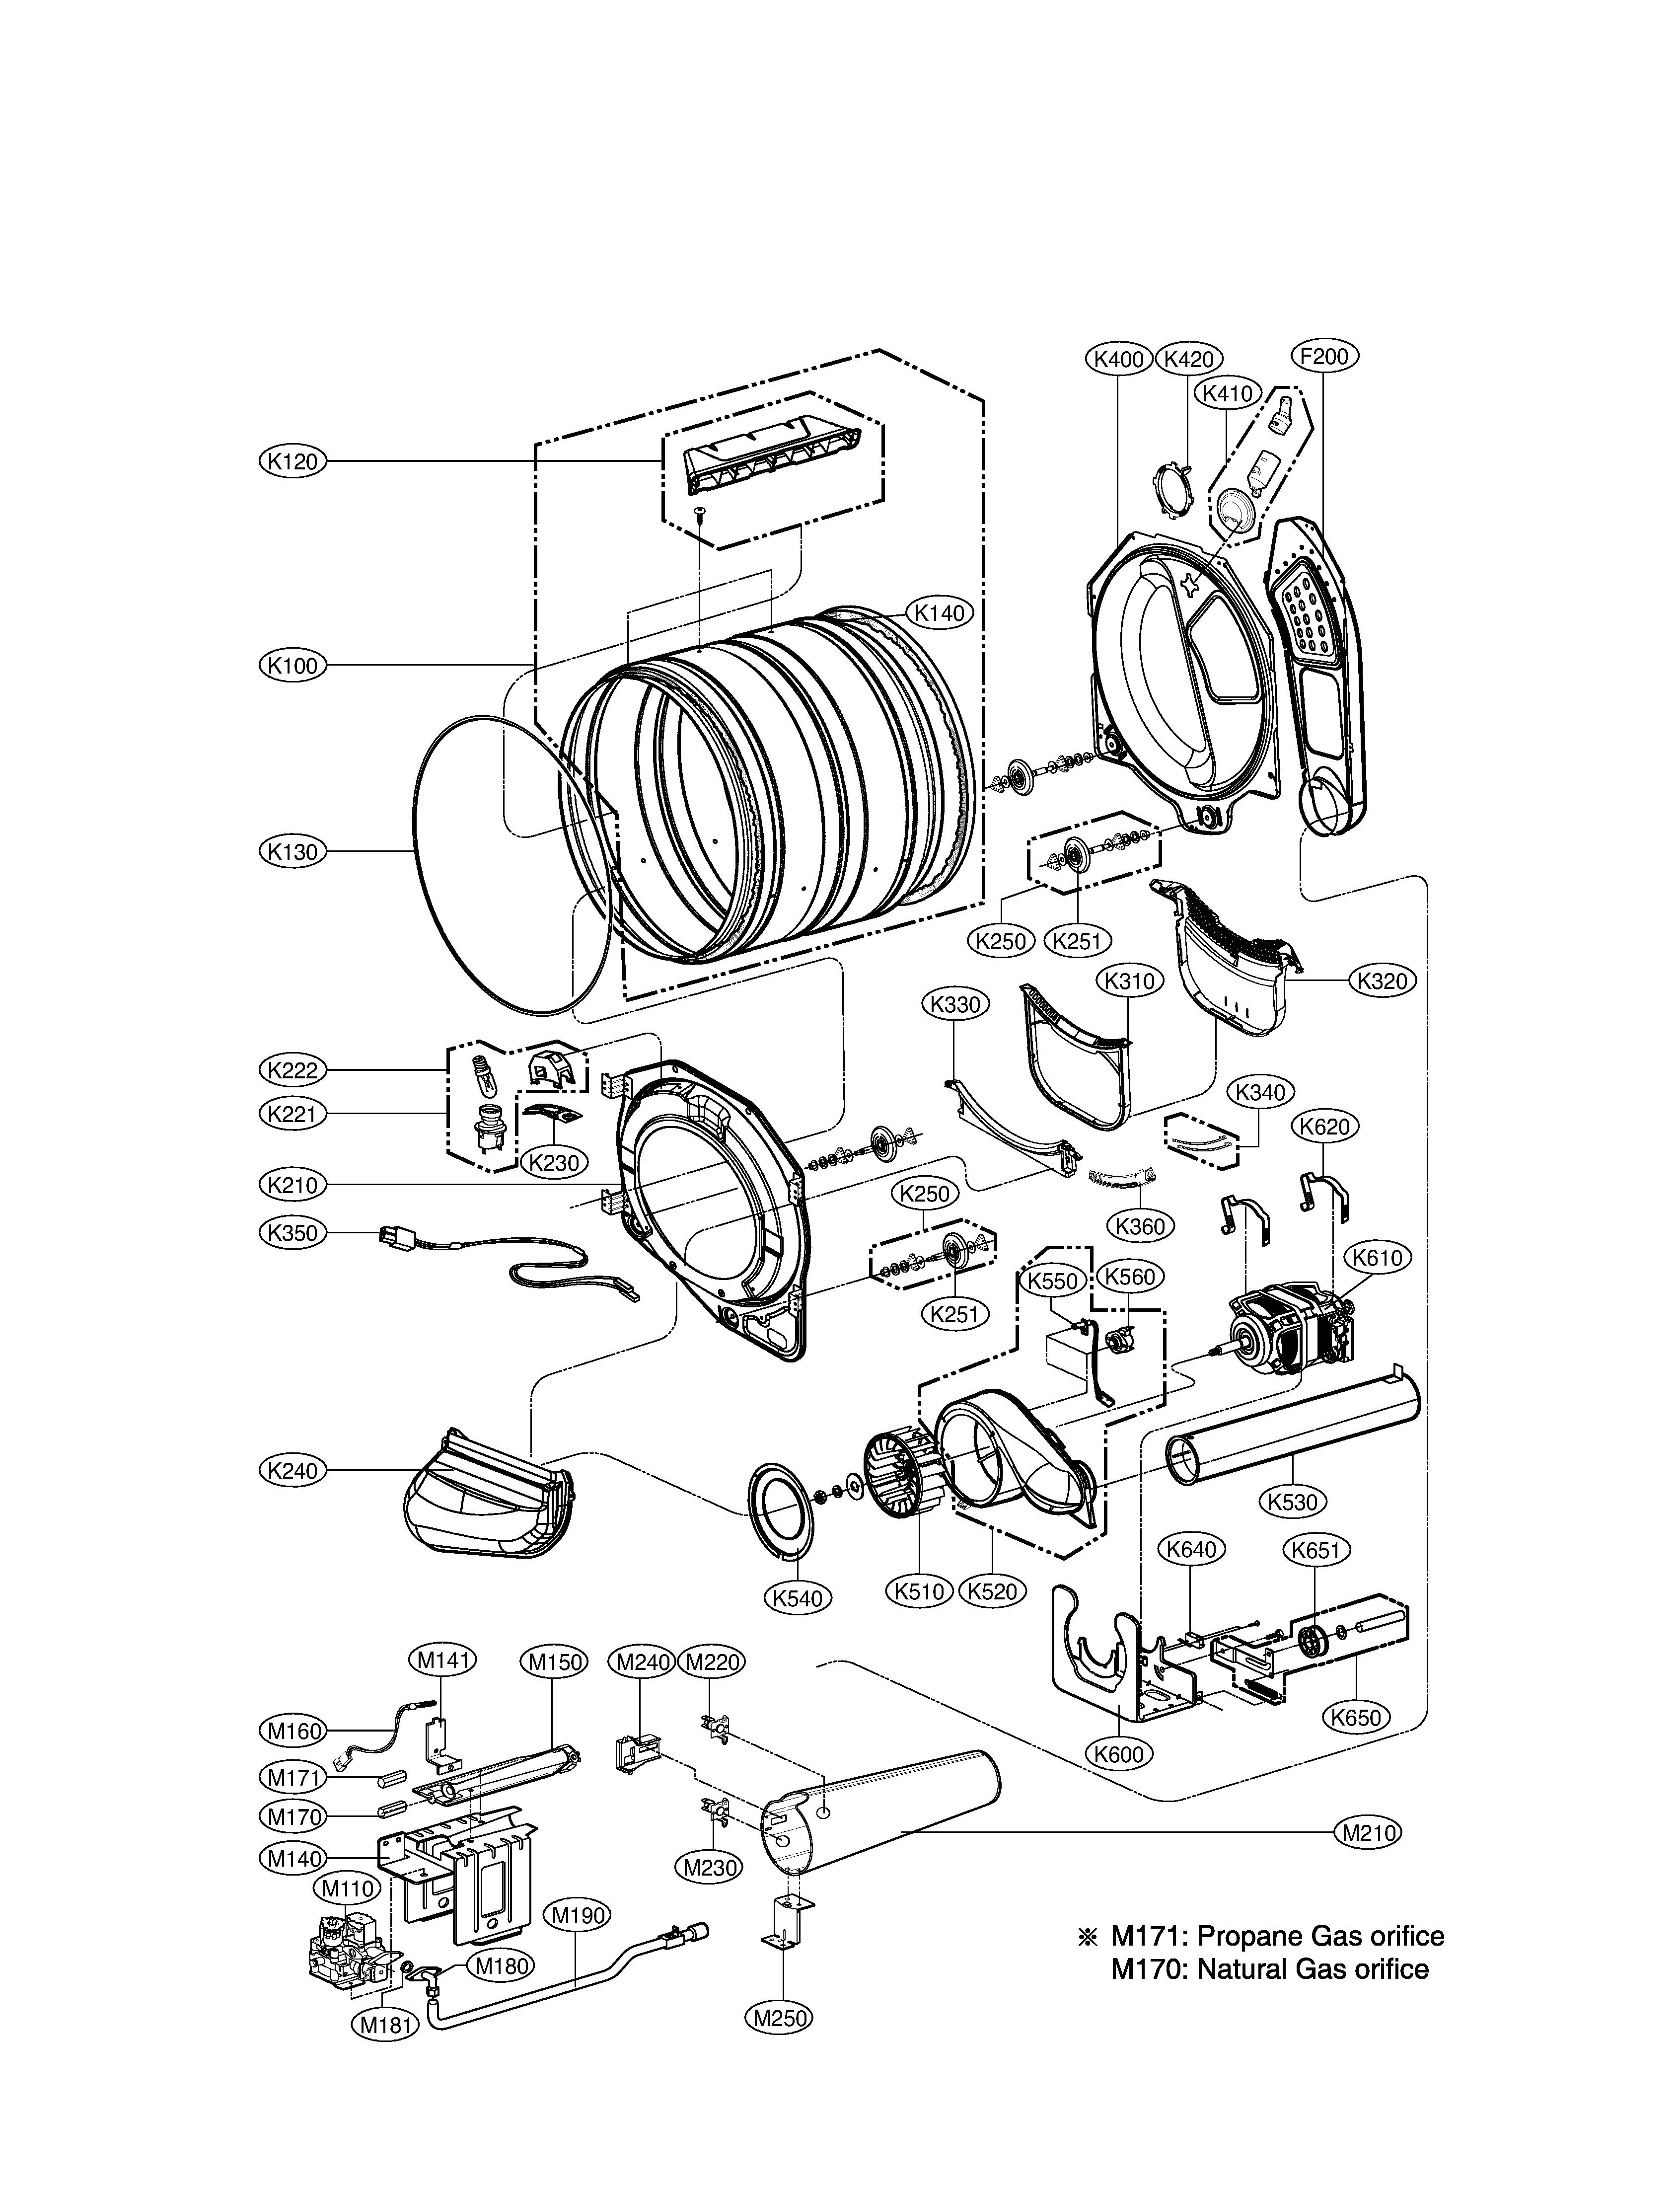 medium resolution of drum motor diagram and parts list for lg dryer parts model diagram dishwasher parts diagram ge dryer parts diagram dometic